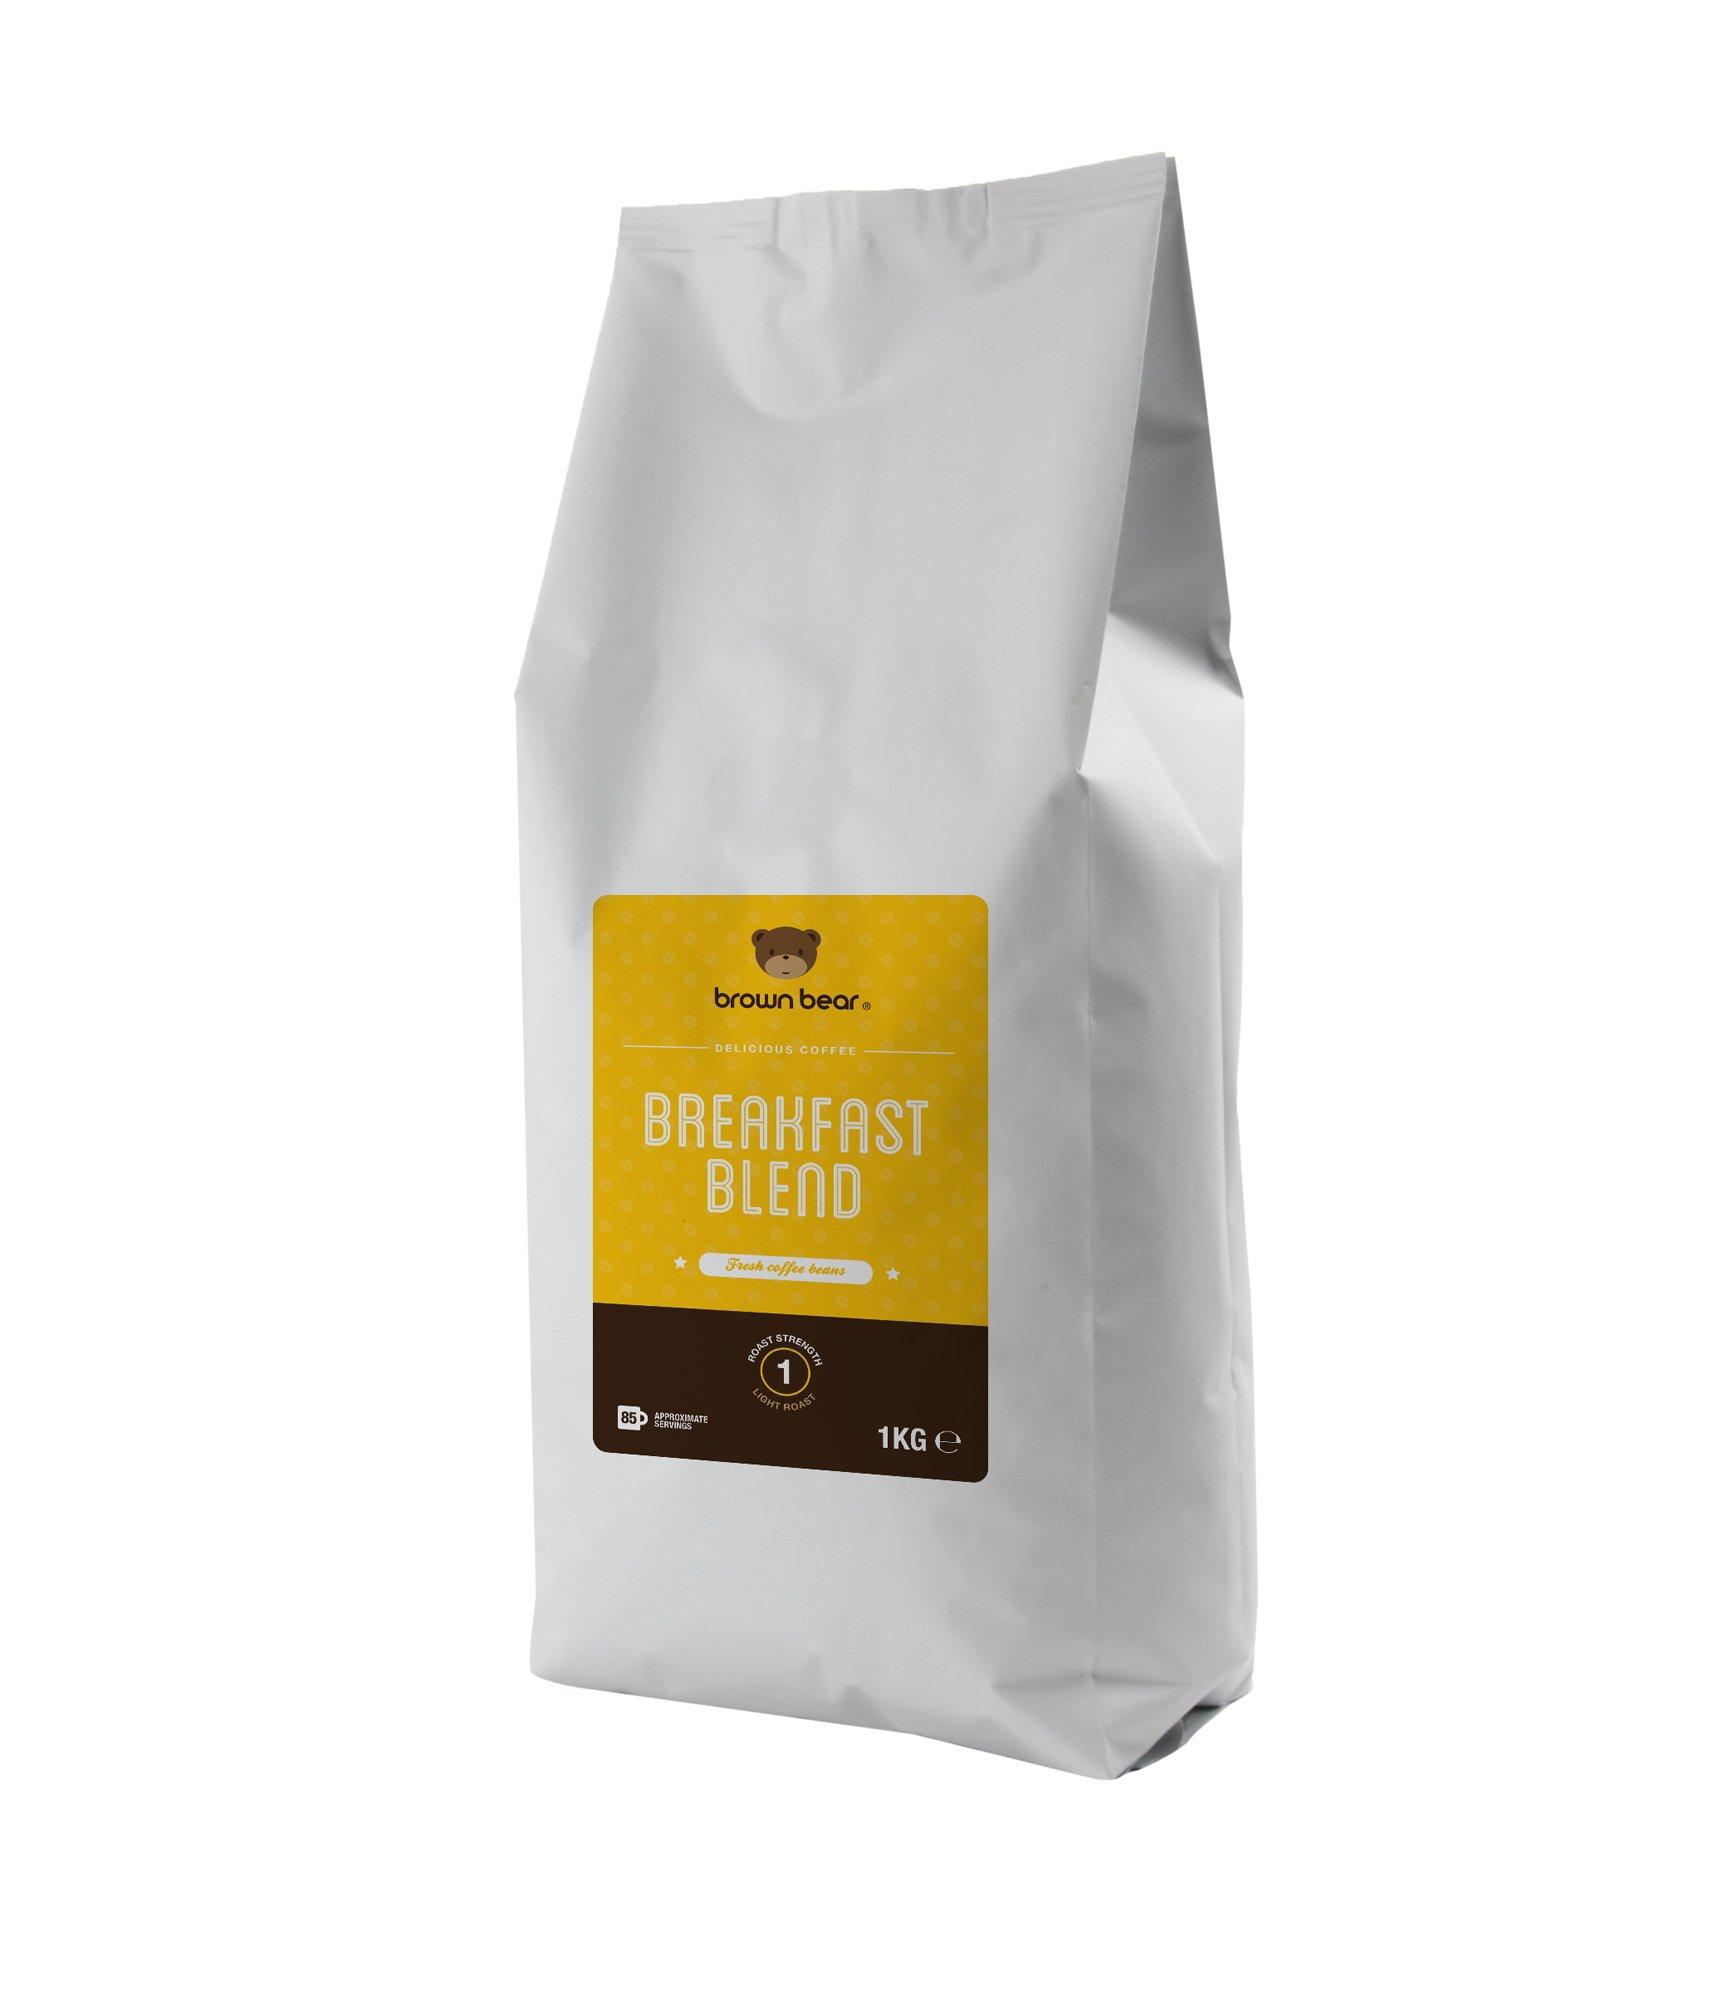 Brown-Bear-Breakfast-Blend-Light-Roast-Whole-Bean-Coffee-Beans-1kg